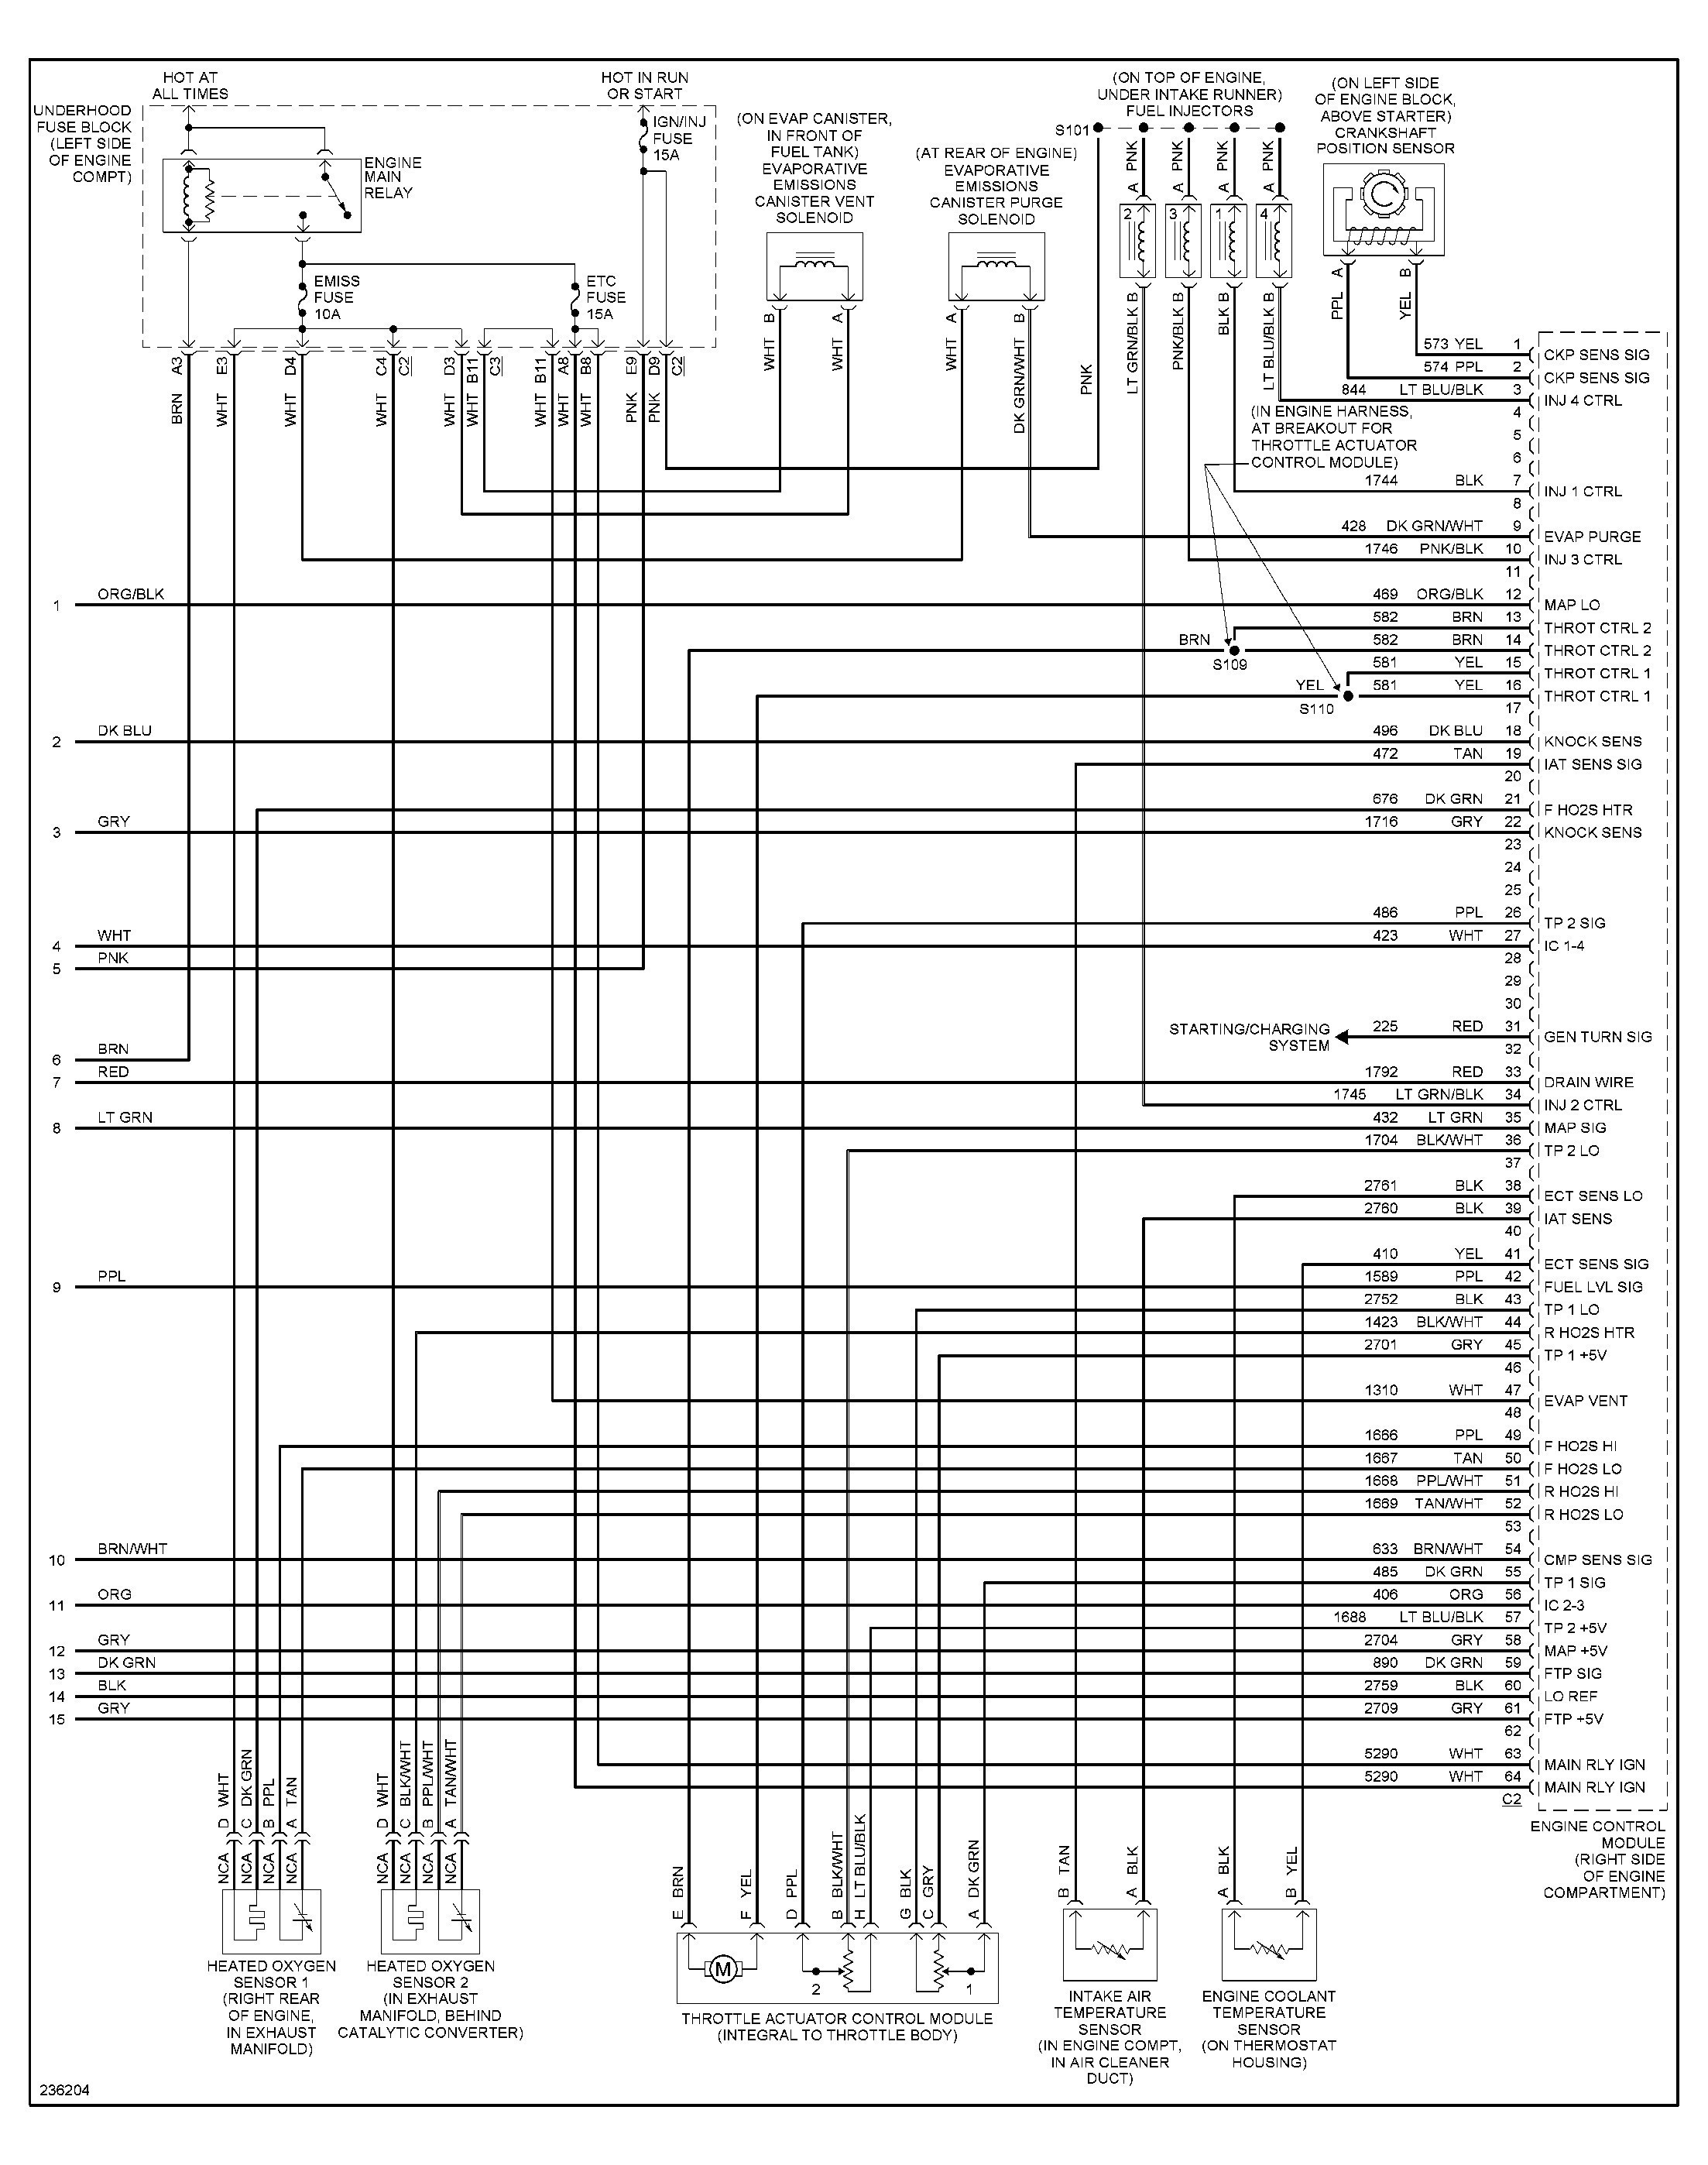 2007 Saturn Aura Engine Diagram 2004 Saturn Vue Engine Diagram Worksheet and Wiring Diagram • Of 2007 Saturn Aura Engine Diagram